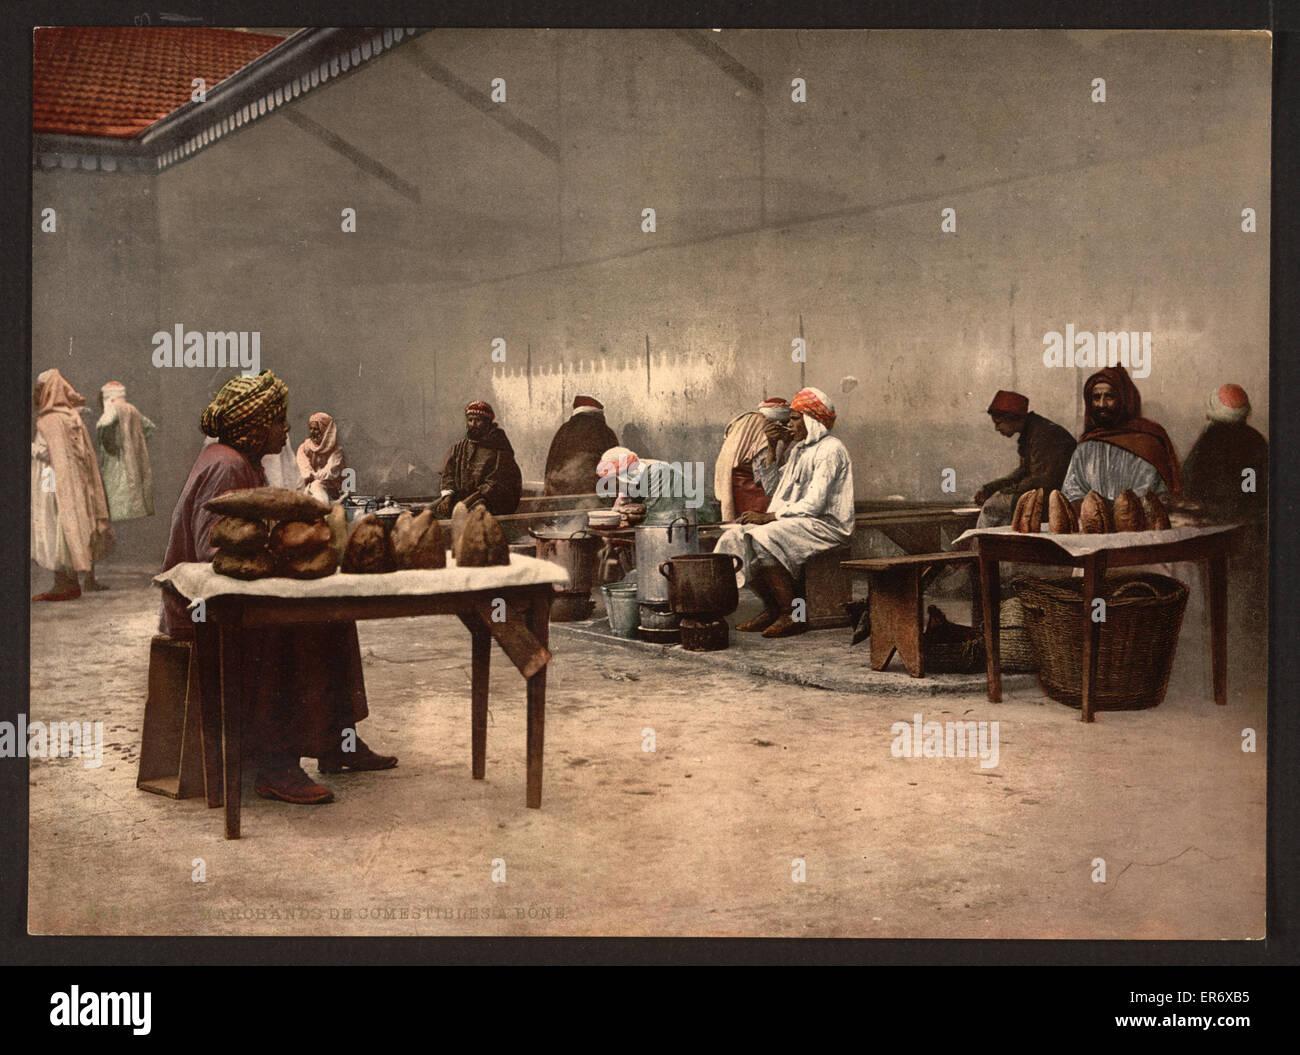 Merchants of eatables, Bona, Algeria. Date ca. 1899. - Stock Image